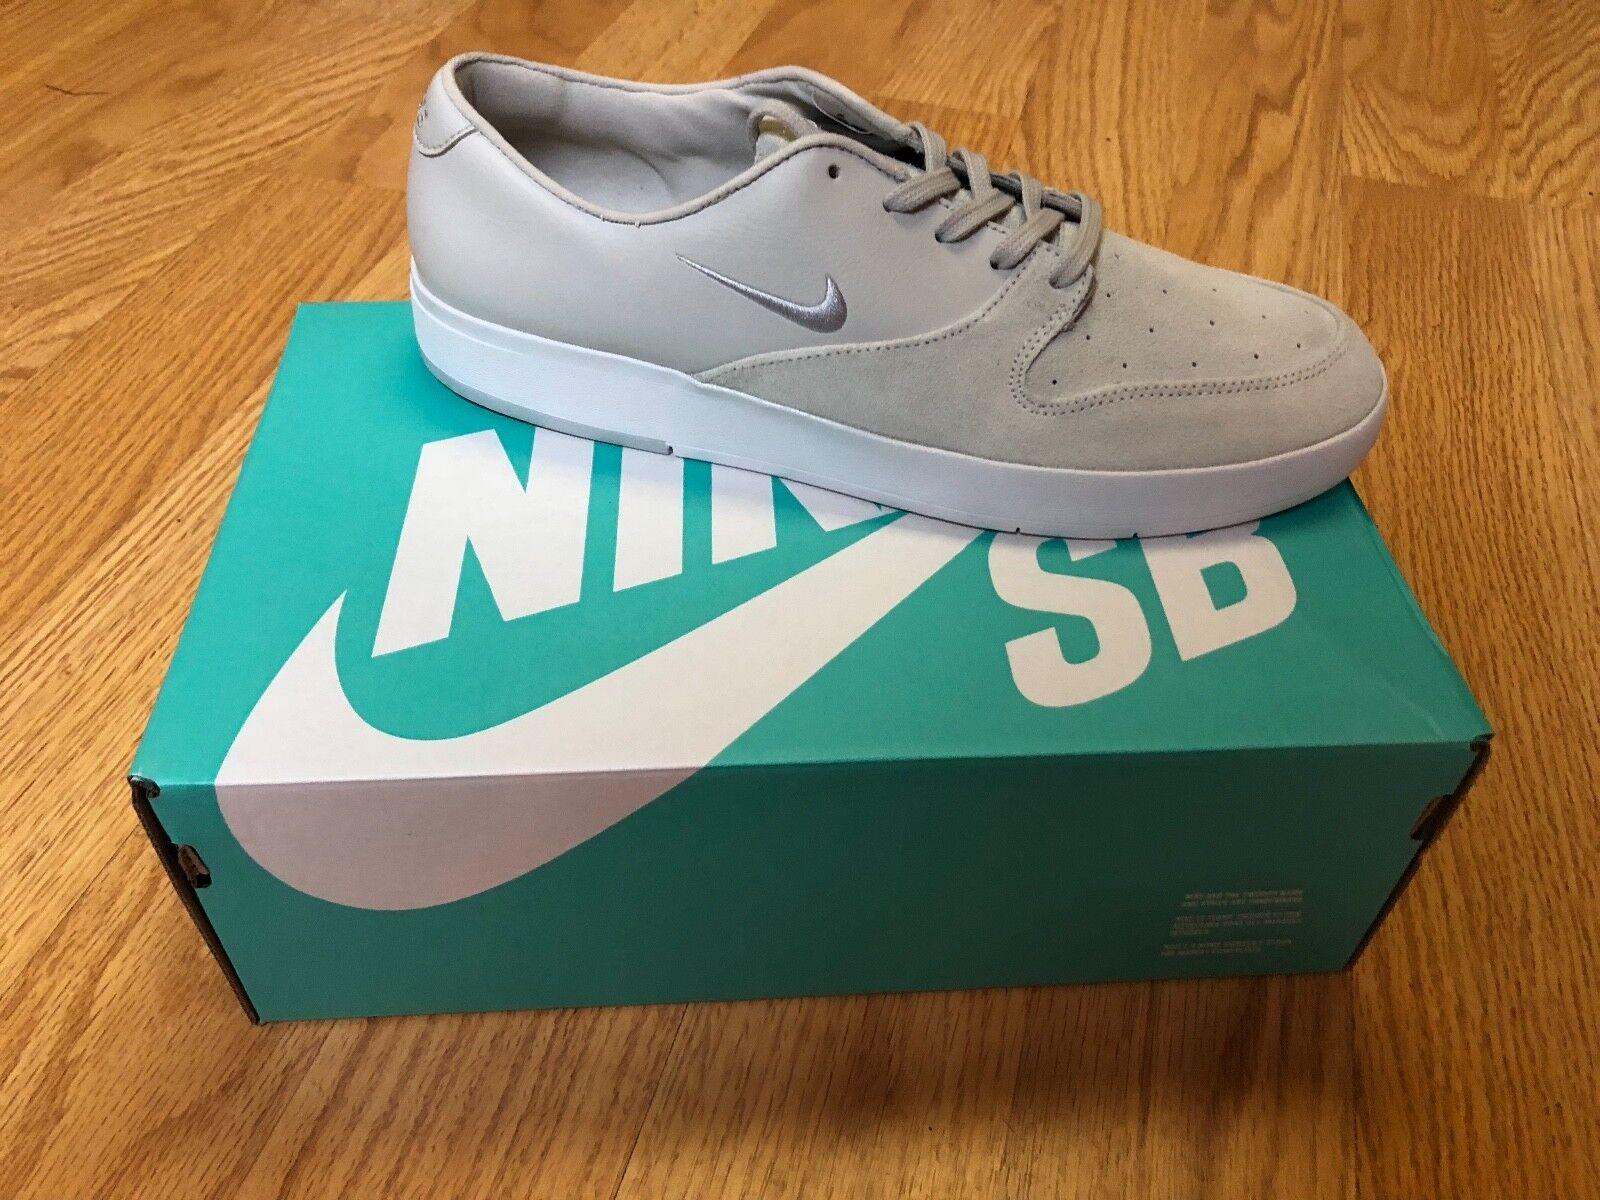 Nike sb paul rodriguez probe, x 12 selten, probe, rodriguez qs, skateboard, tz bab33a